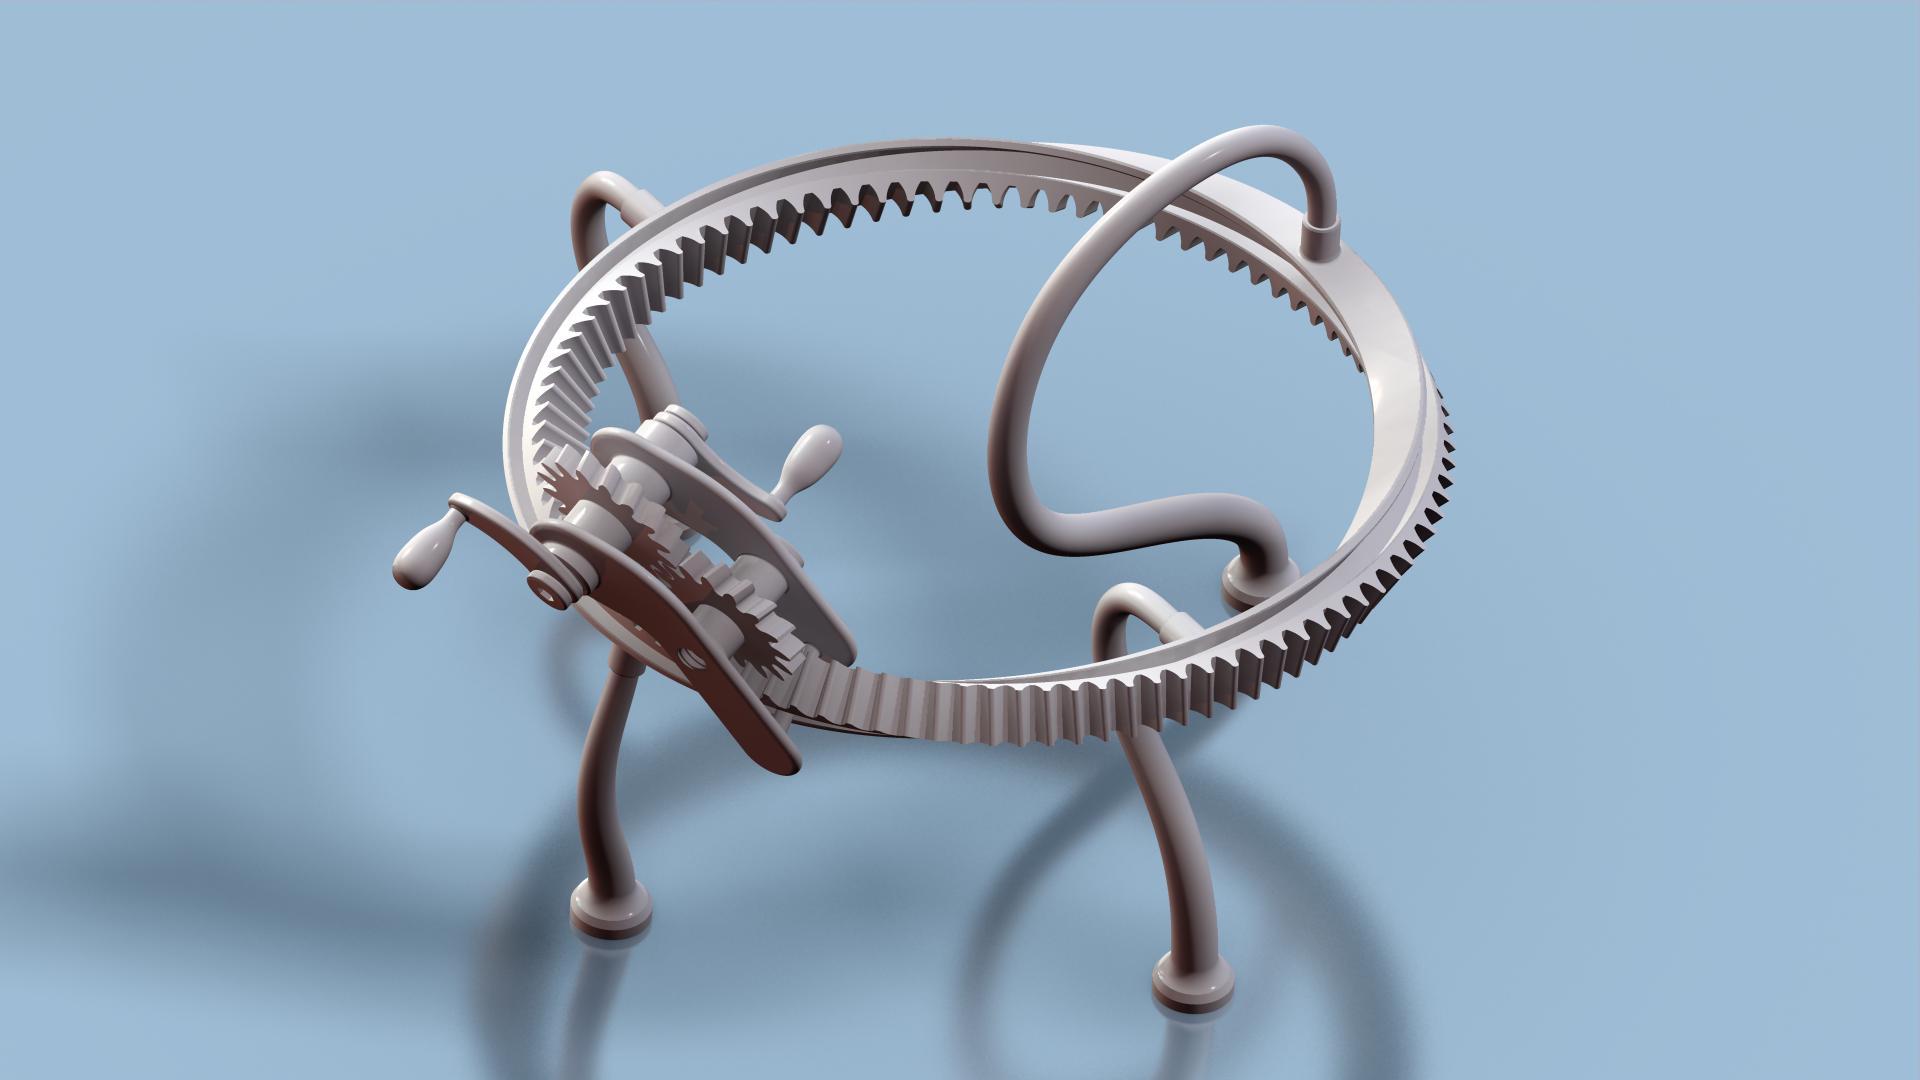 twister-01.jpg